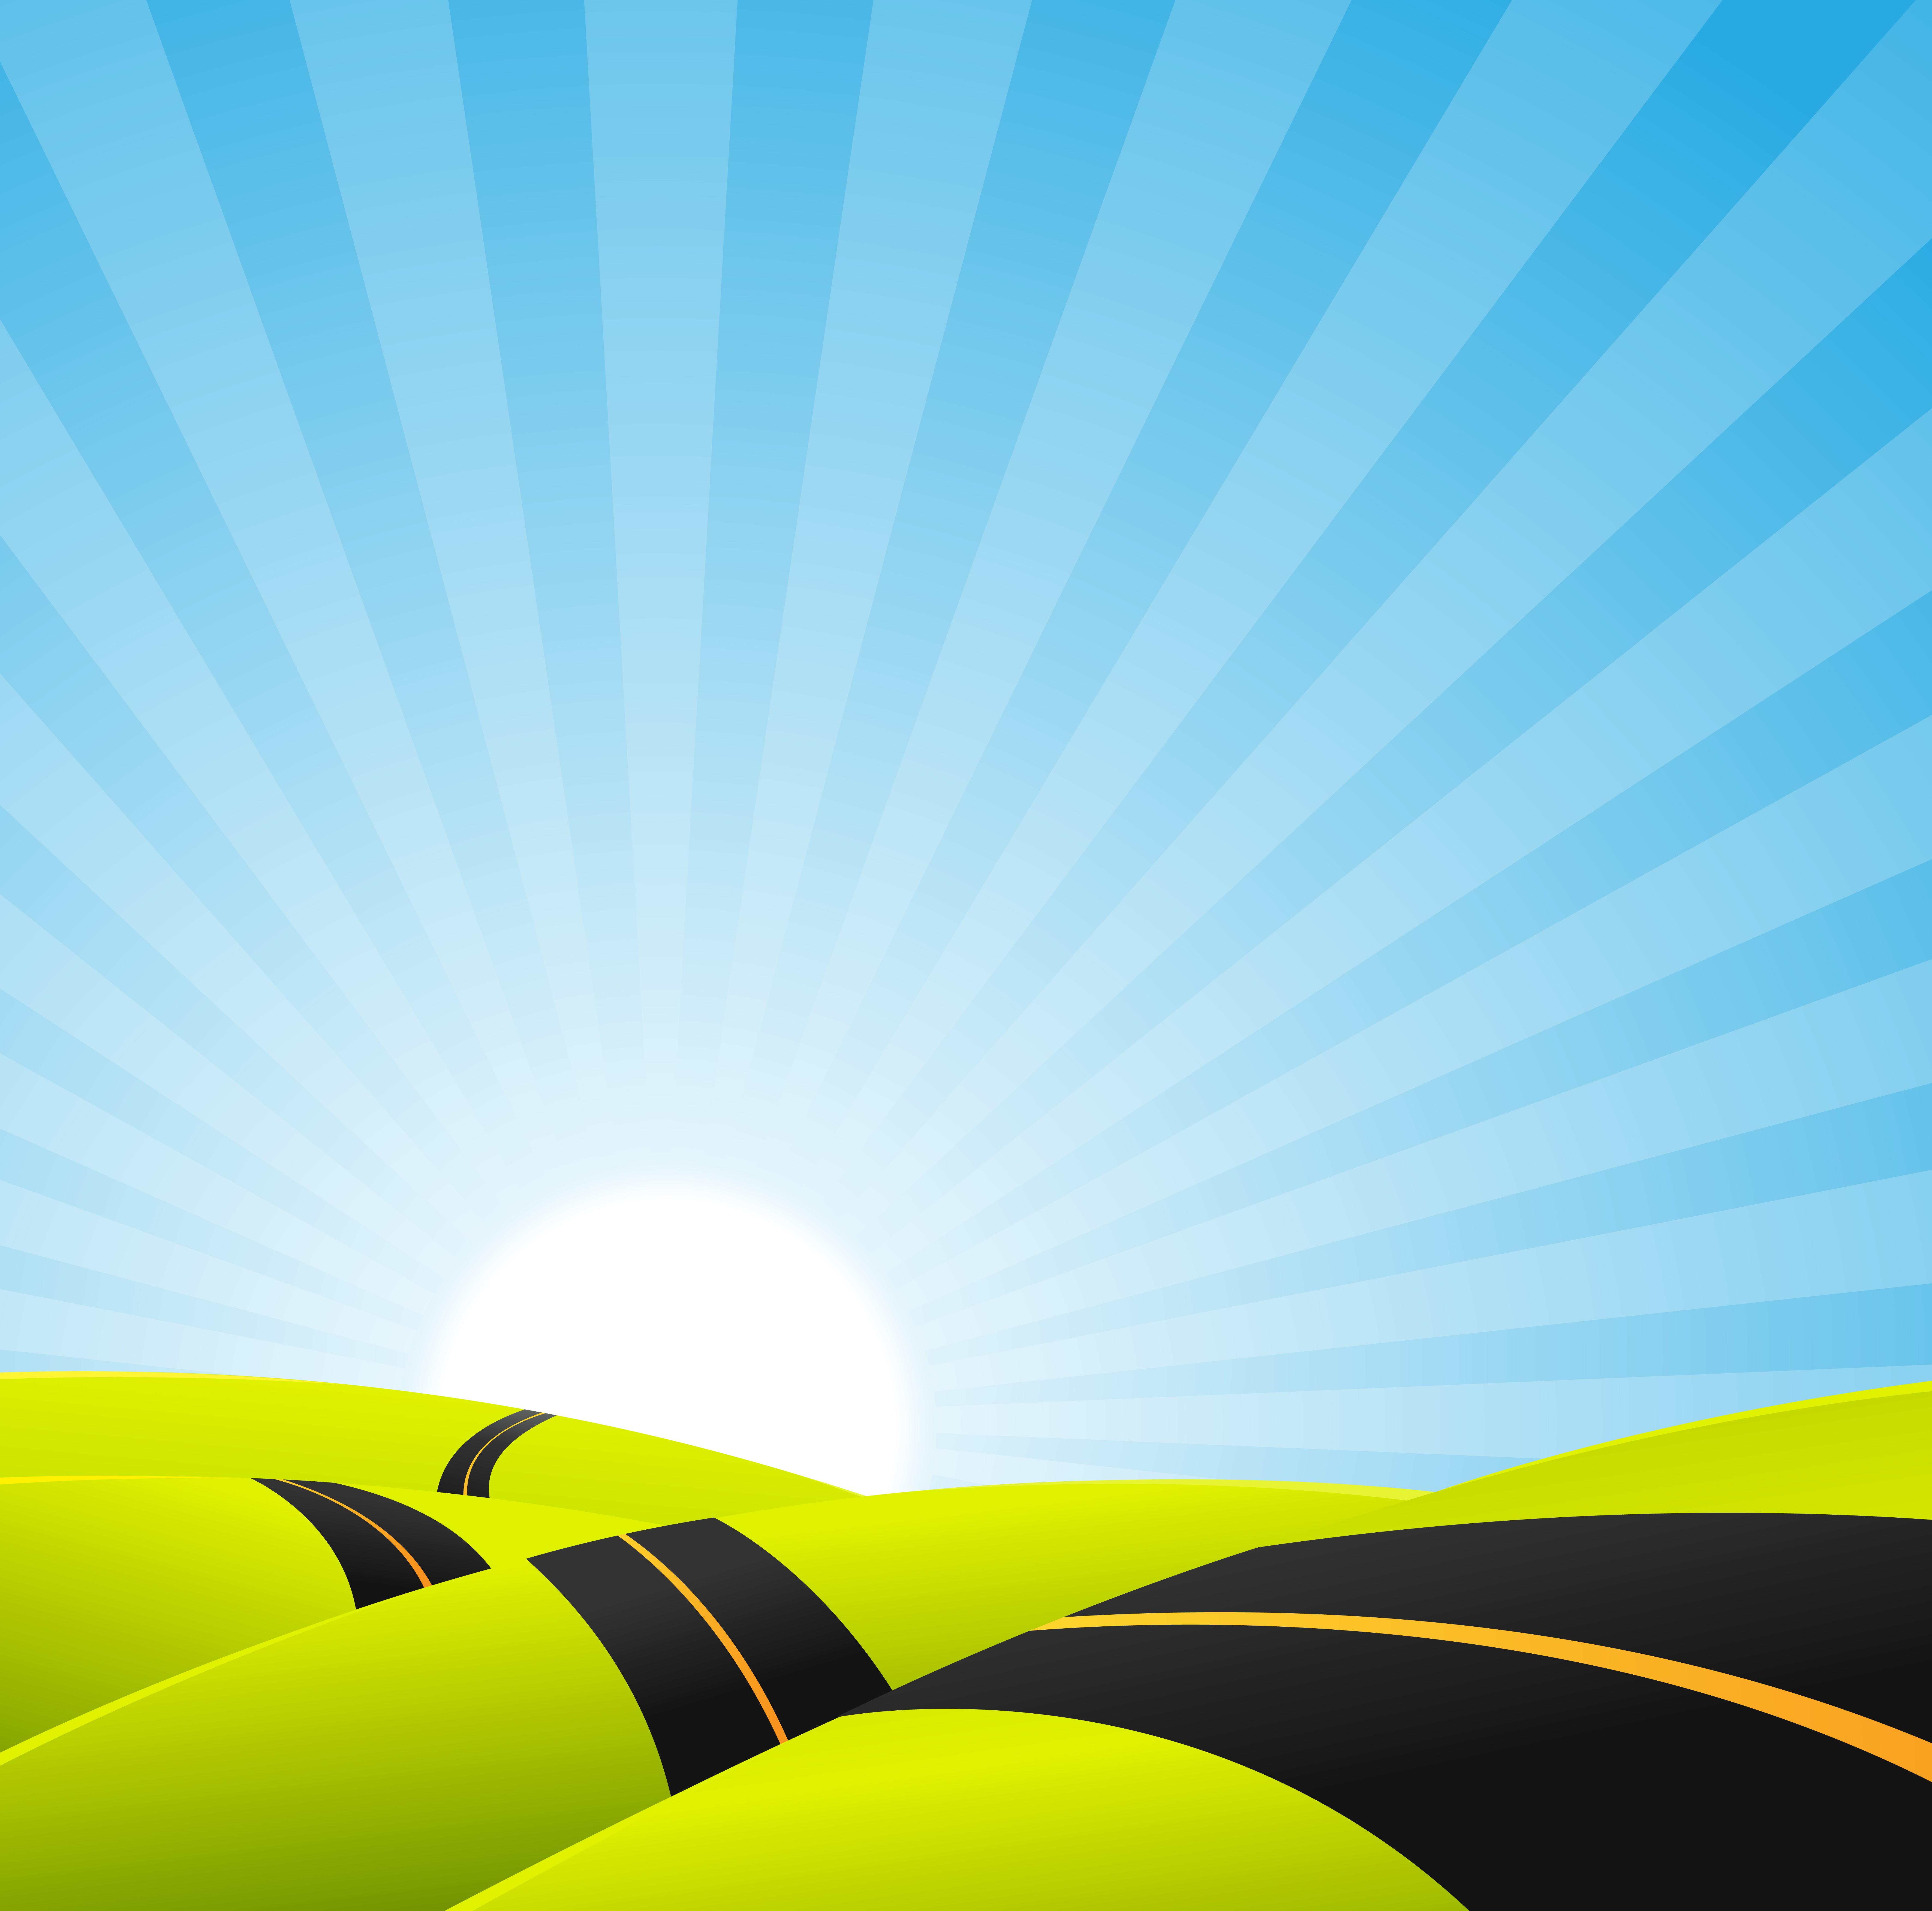 Long Journey Background Download Free Vectors Clipart Graphics Amp Vector Art